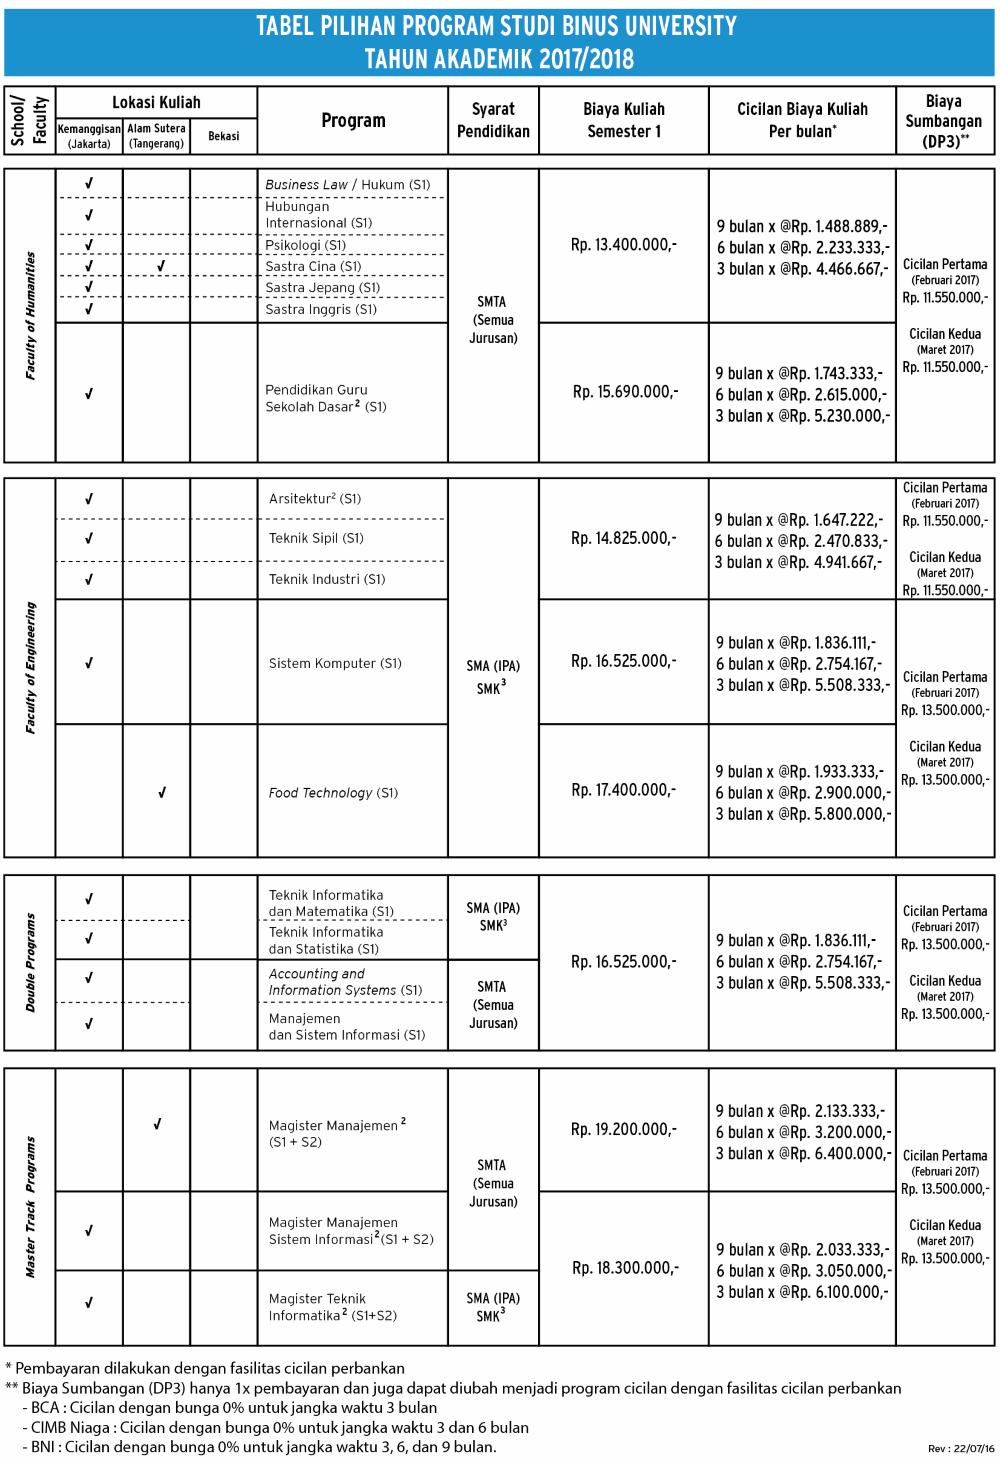 biaya-kuliah-binus-university-per-semester